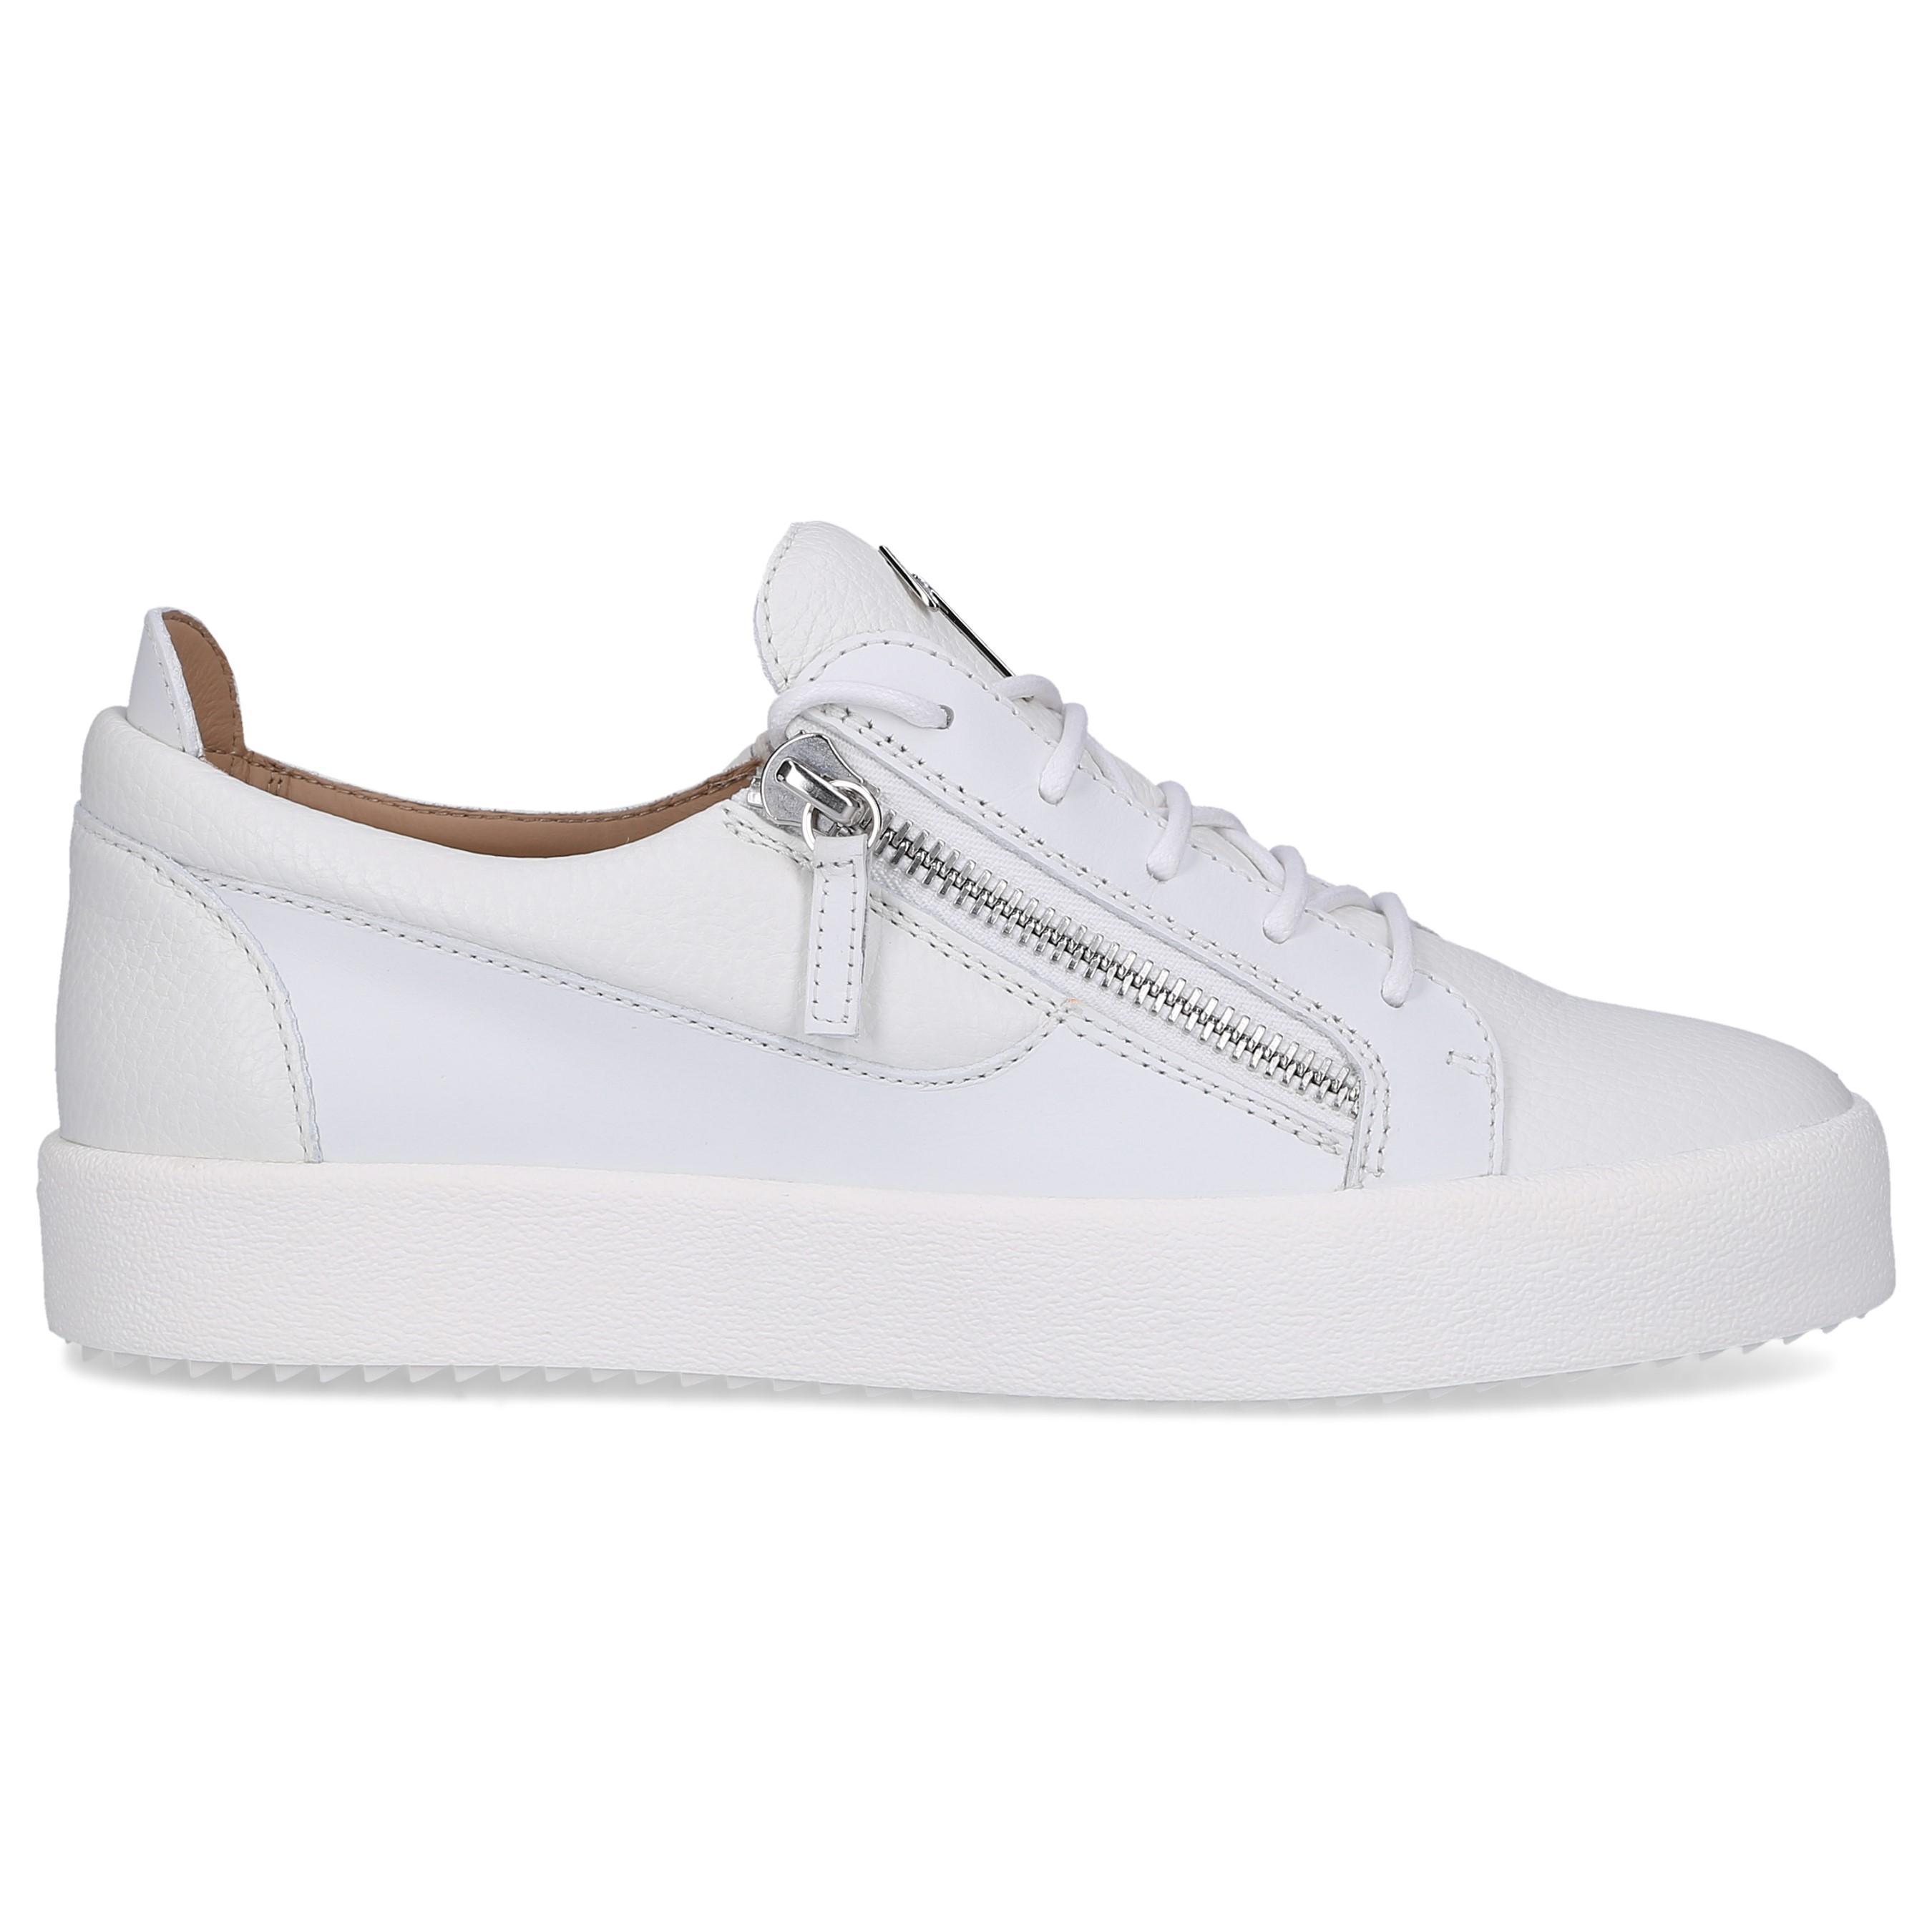 3ca55f74c982a Lyst - Giuseppe Zanotti Sneakers White Frankie in White for Men